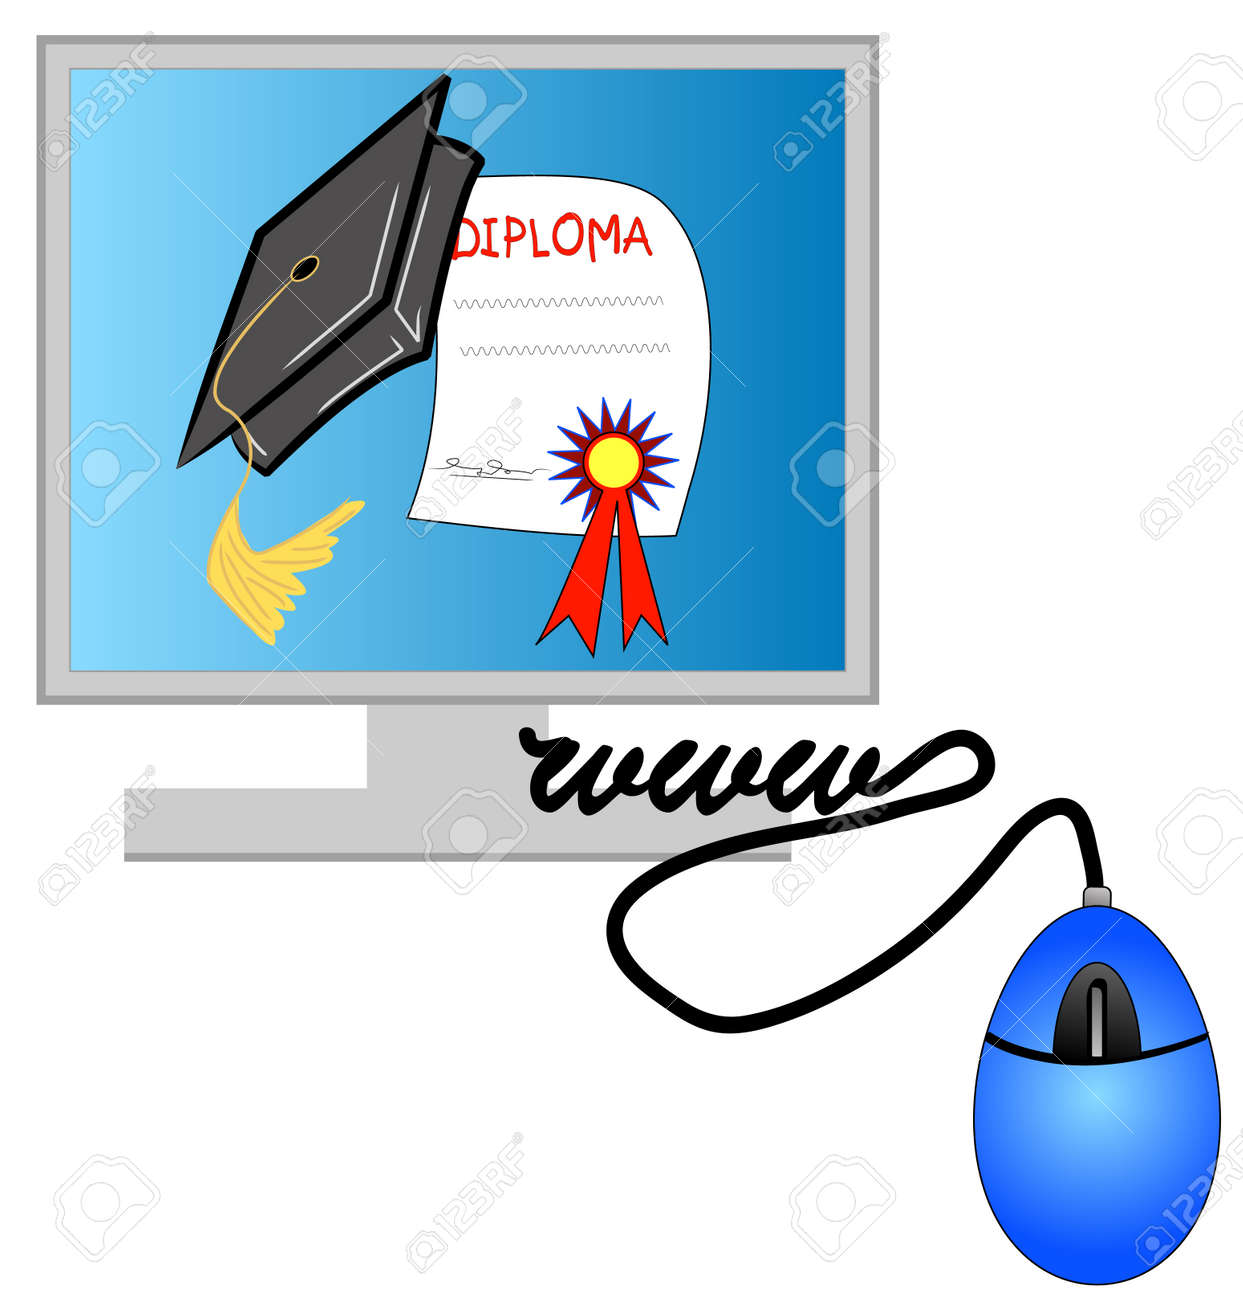 computer internet diploma and graduation cap online studies  computer internet diploma and graduation cap online studies stock vector 3367769